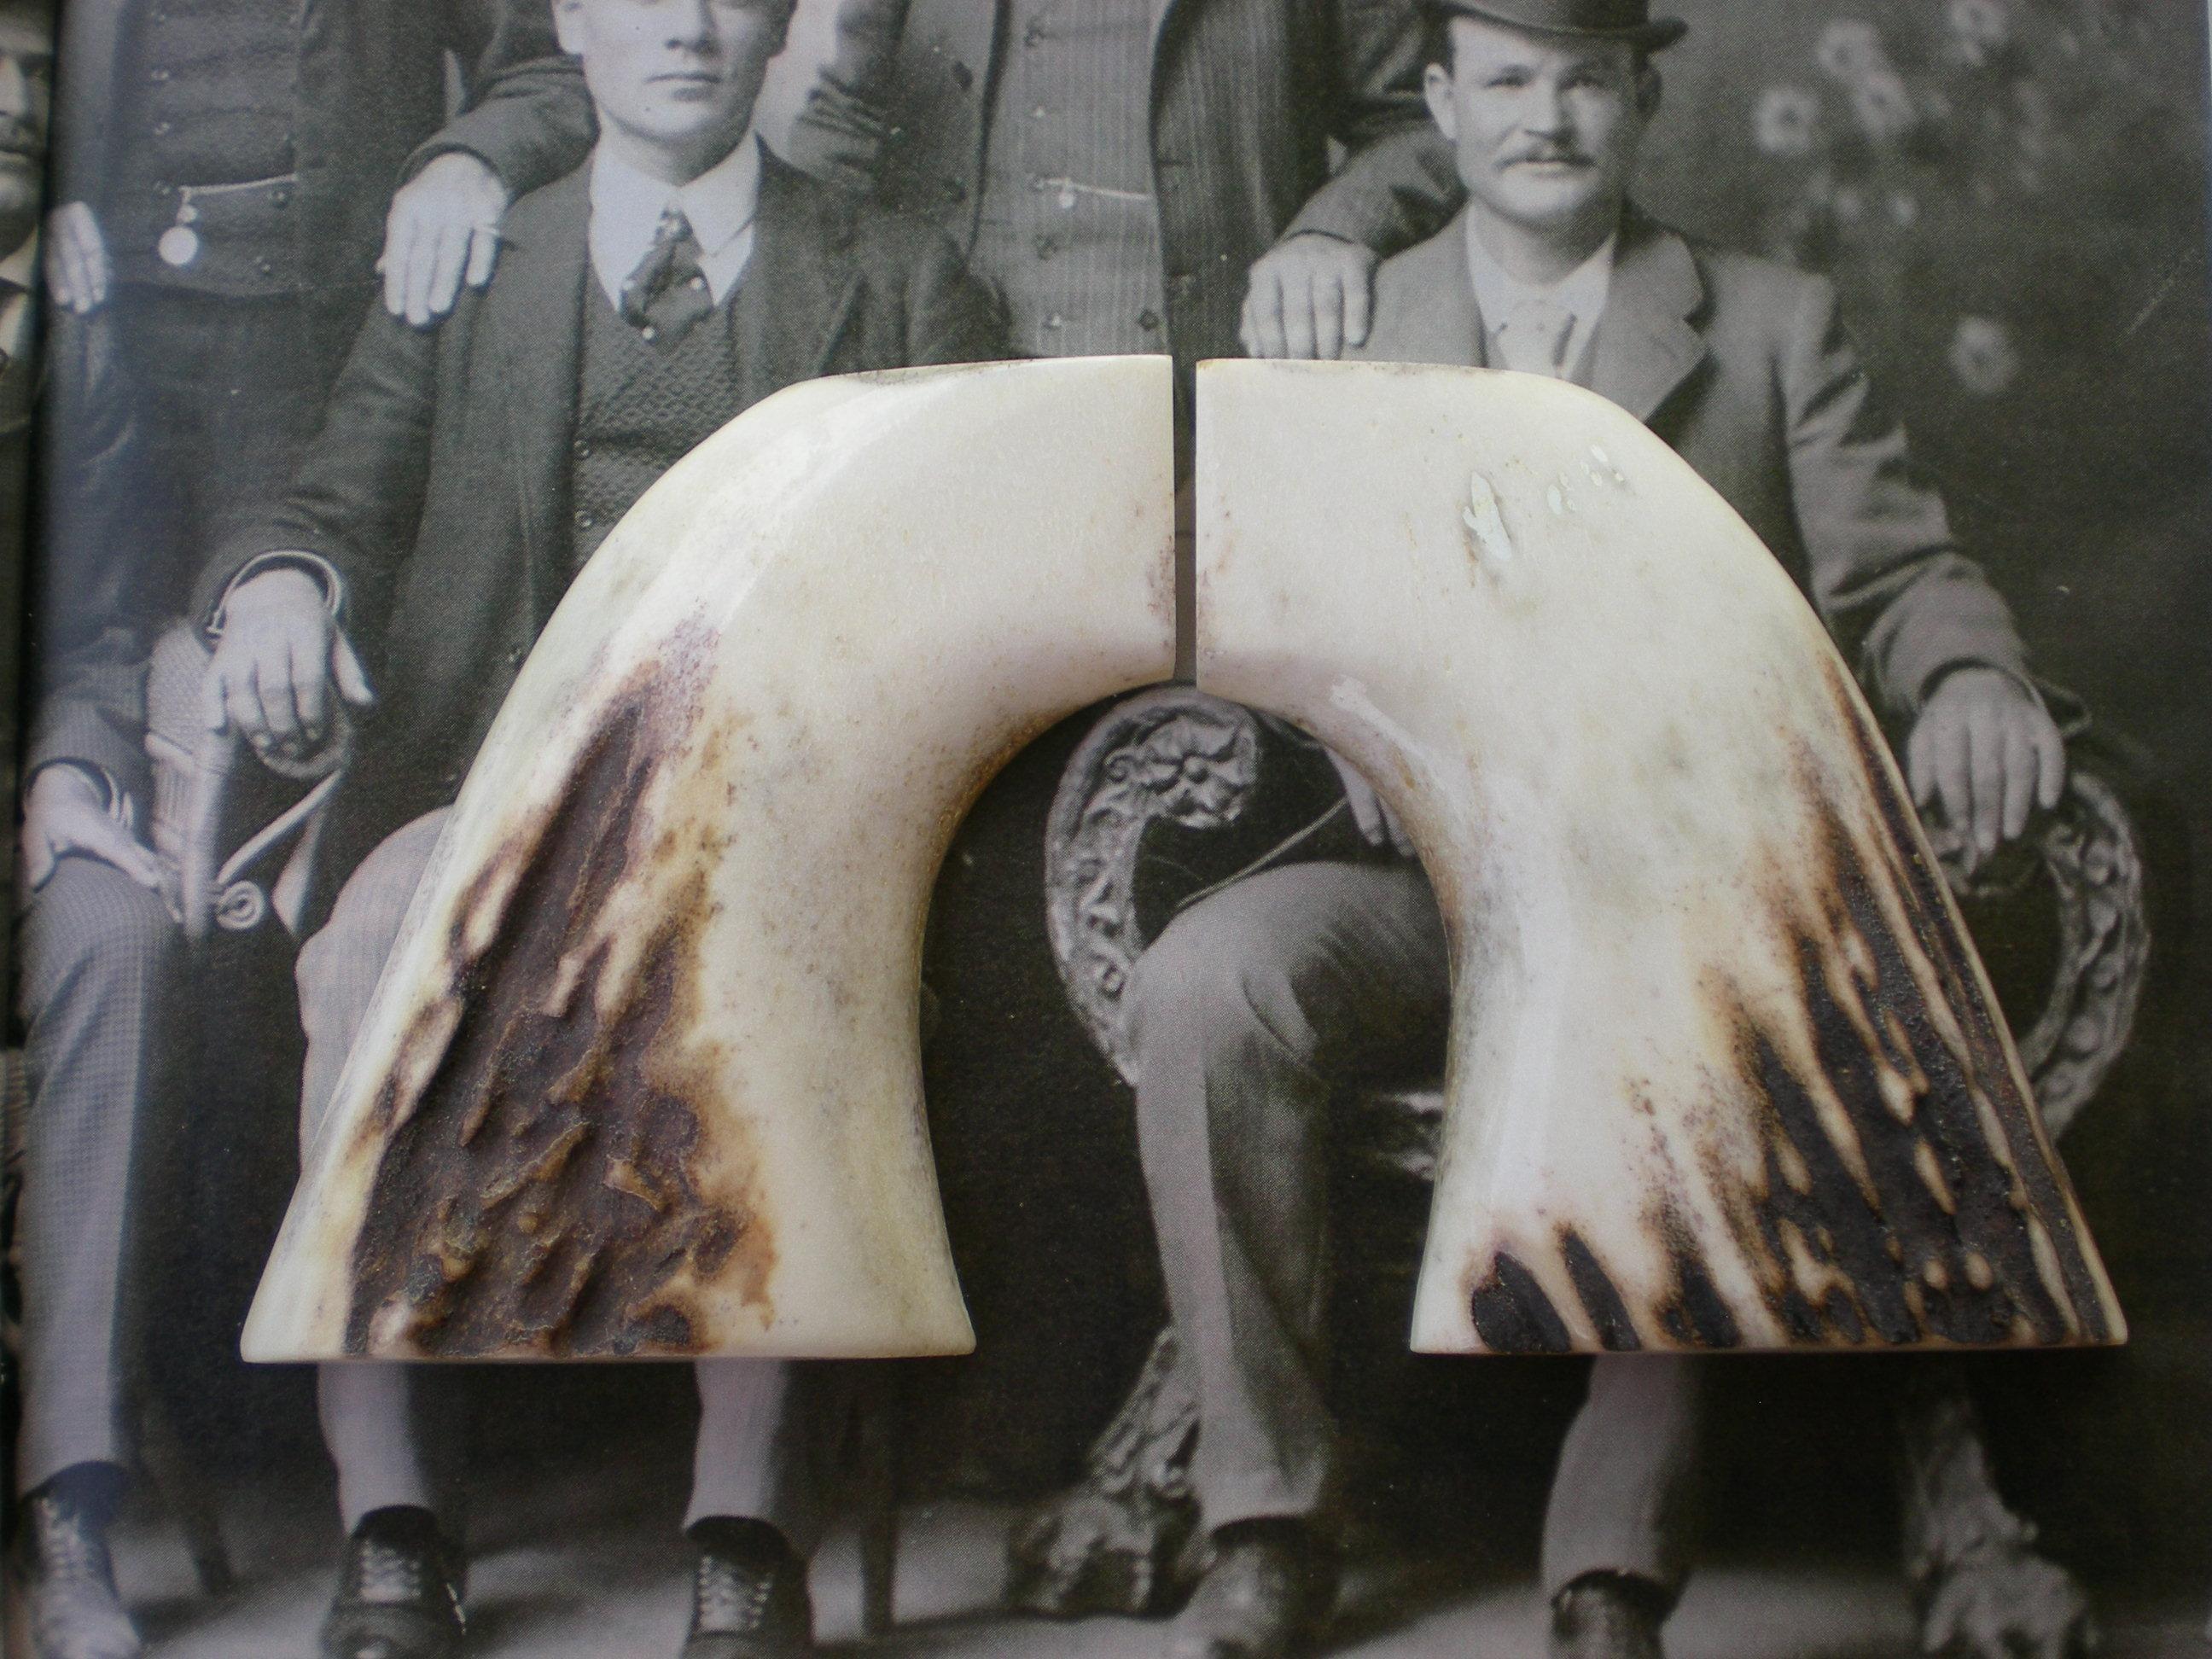 George & Rose - hand made Custom grips - 1911, 1873, colt python